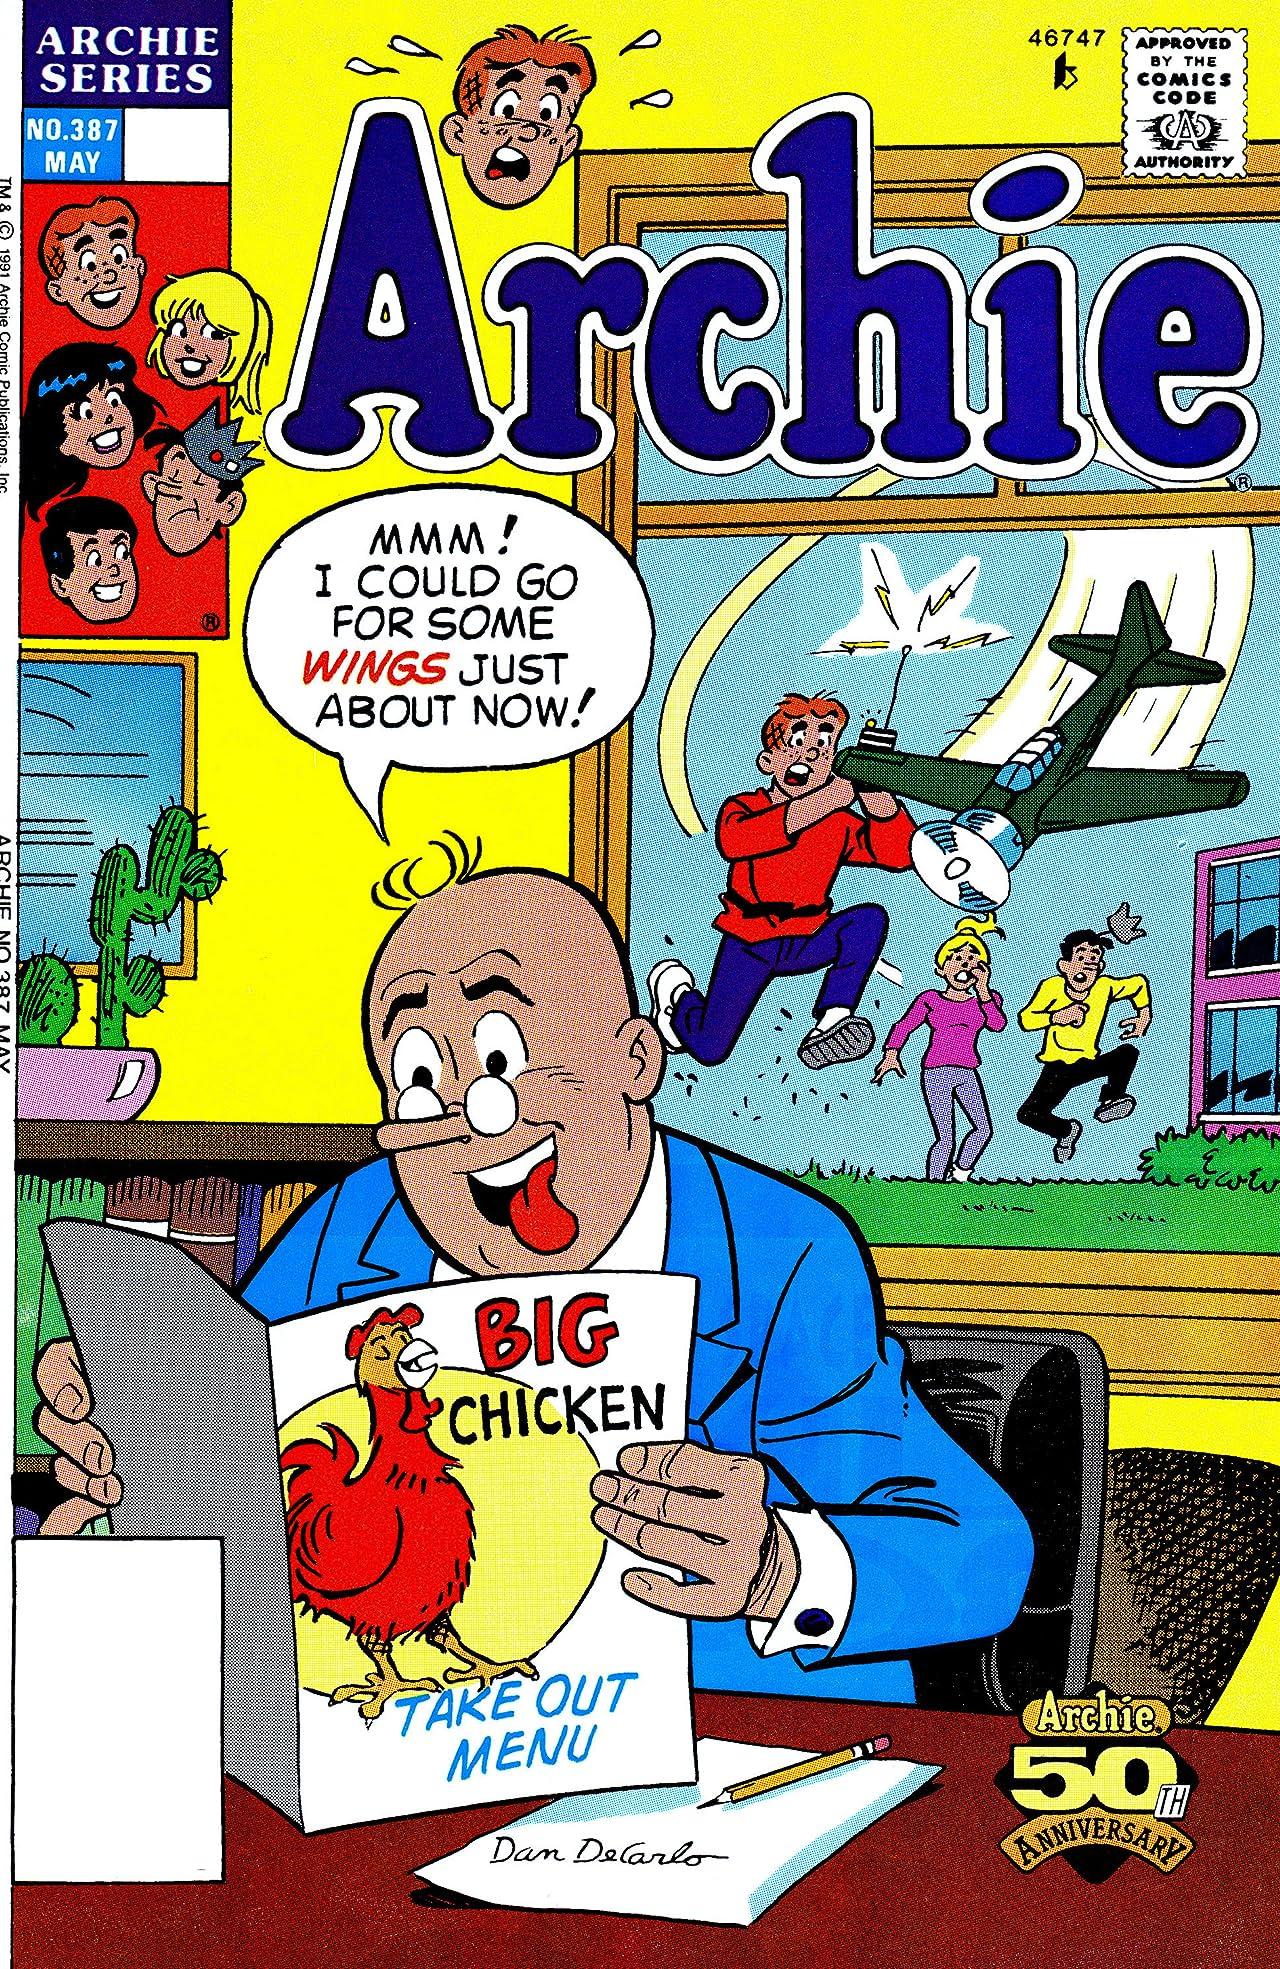 Archie #387